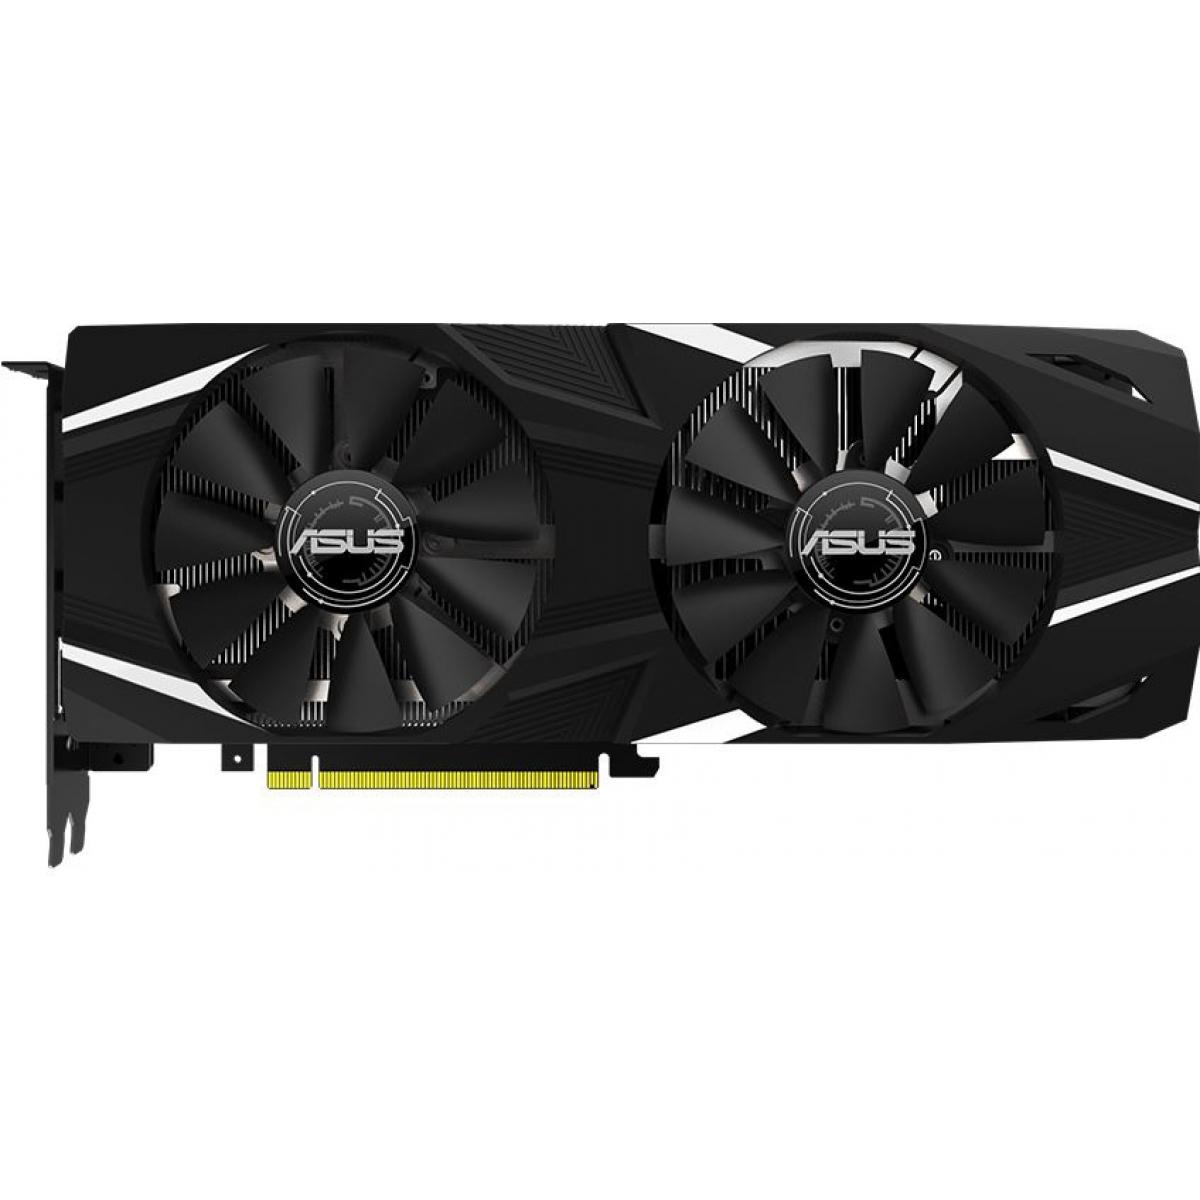 Placa de Vídeo Asus Geforce RTX 2080 Dual OC, 8GB GDDR6, 256Bit, DUAL-RTX2080-O8G